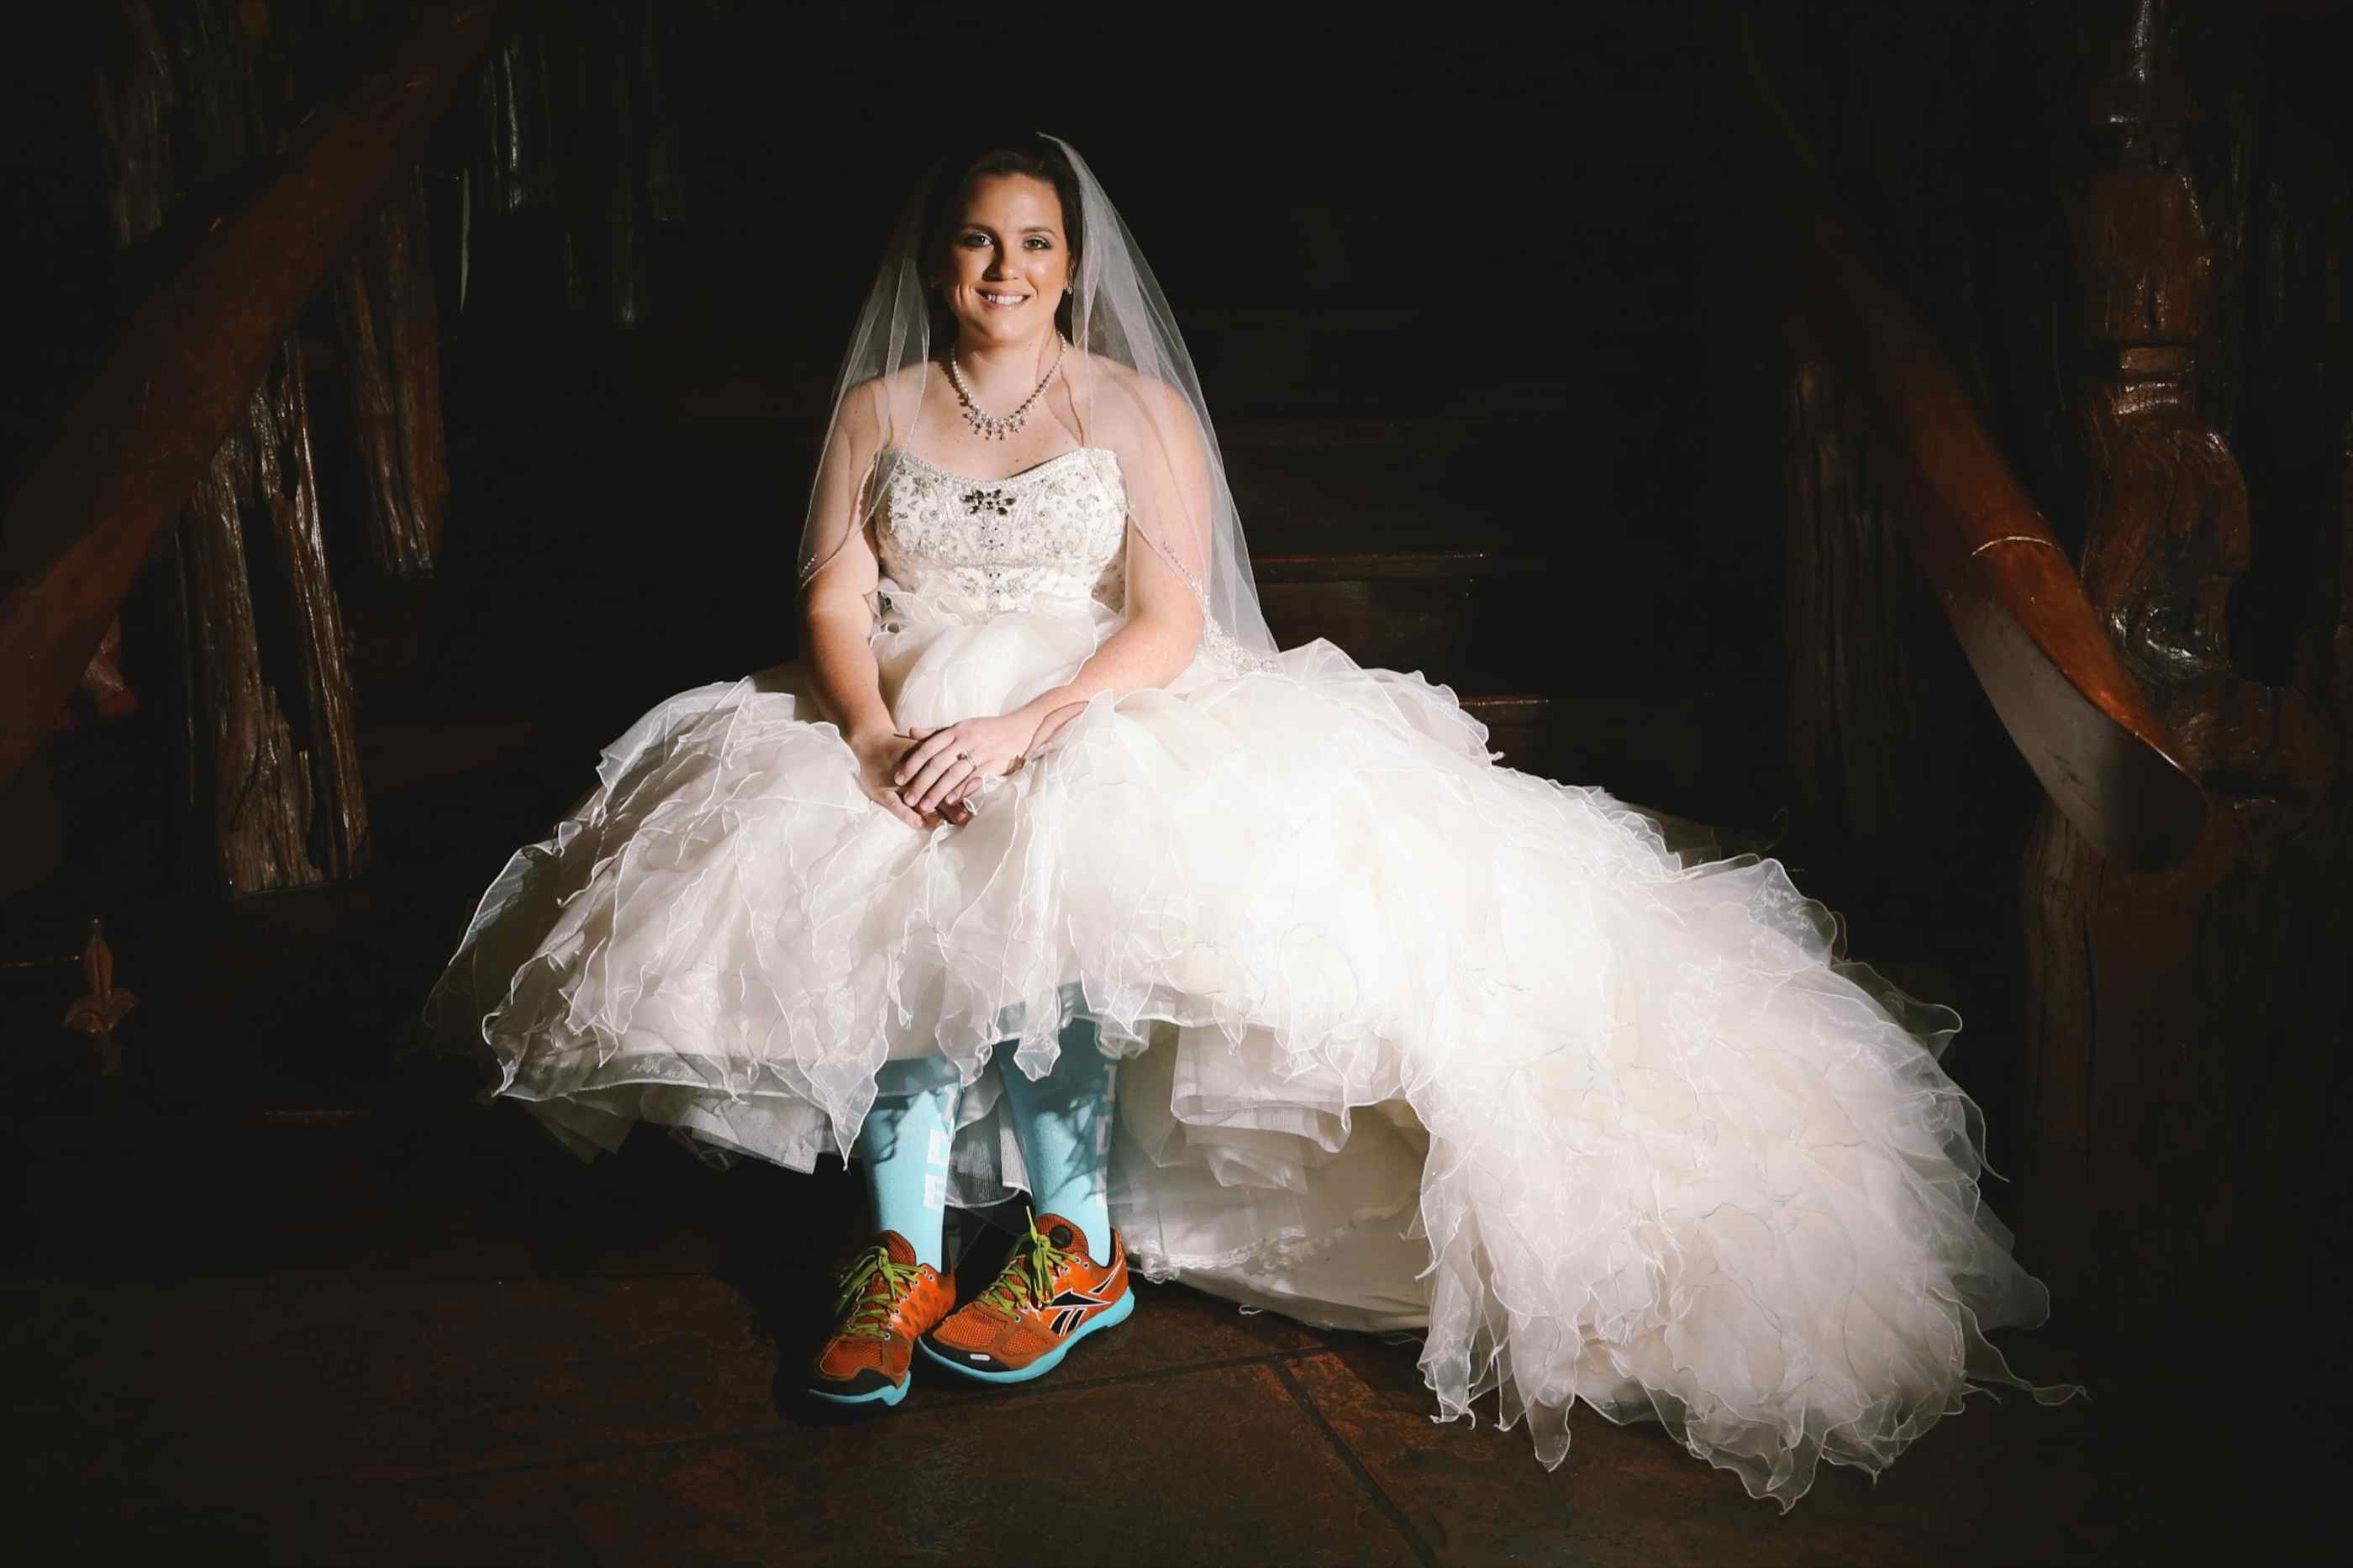 top-10-bride-photos-2013-010